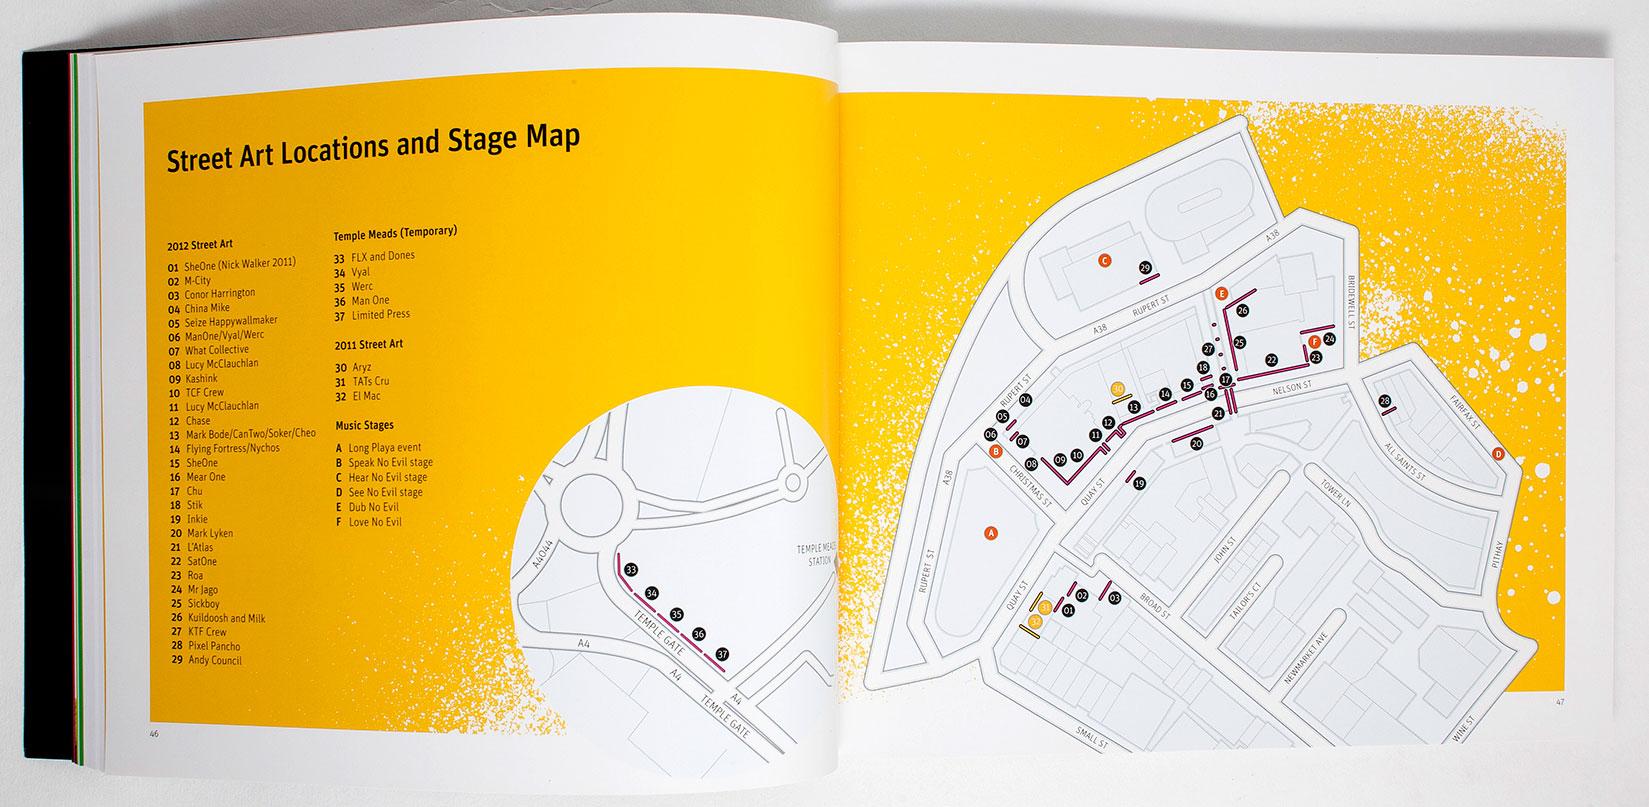 epm-print-management-bristol-art-books-see-no-evil-3.jpg